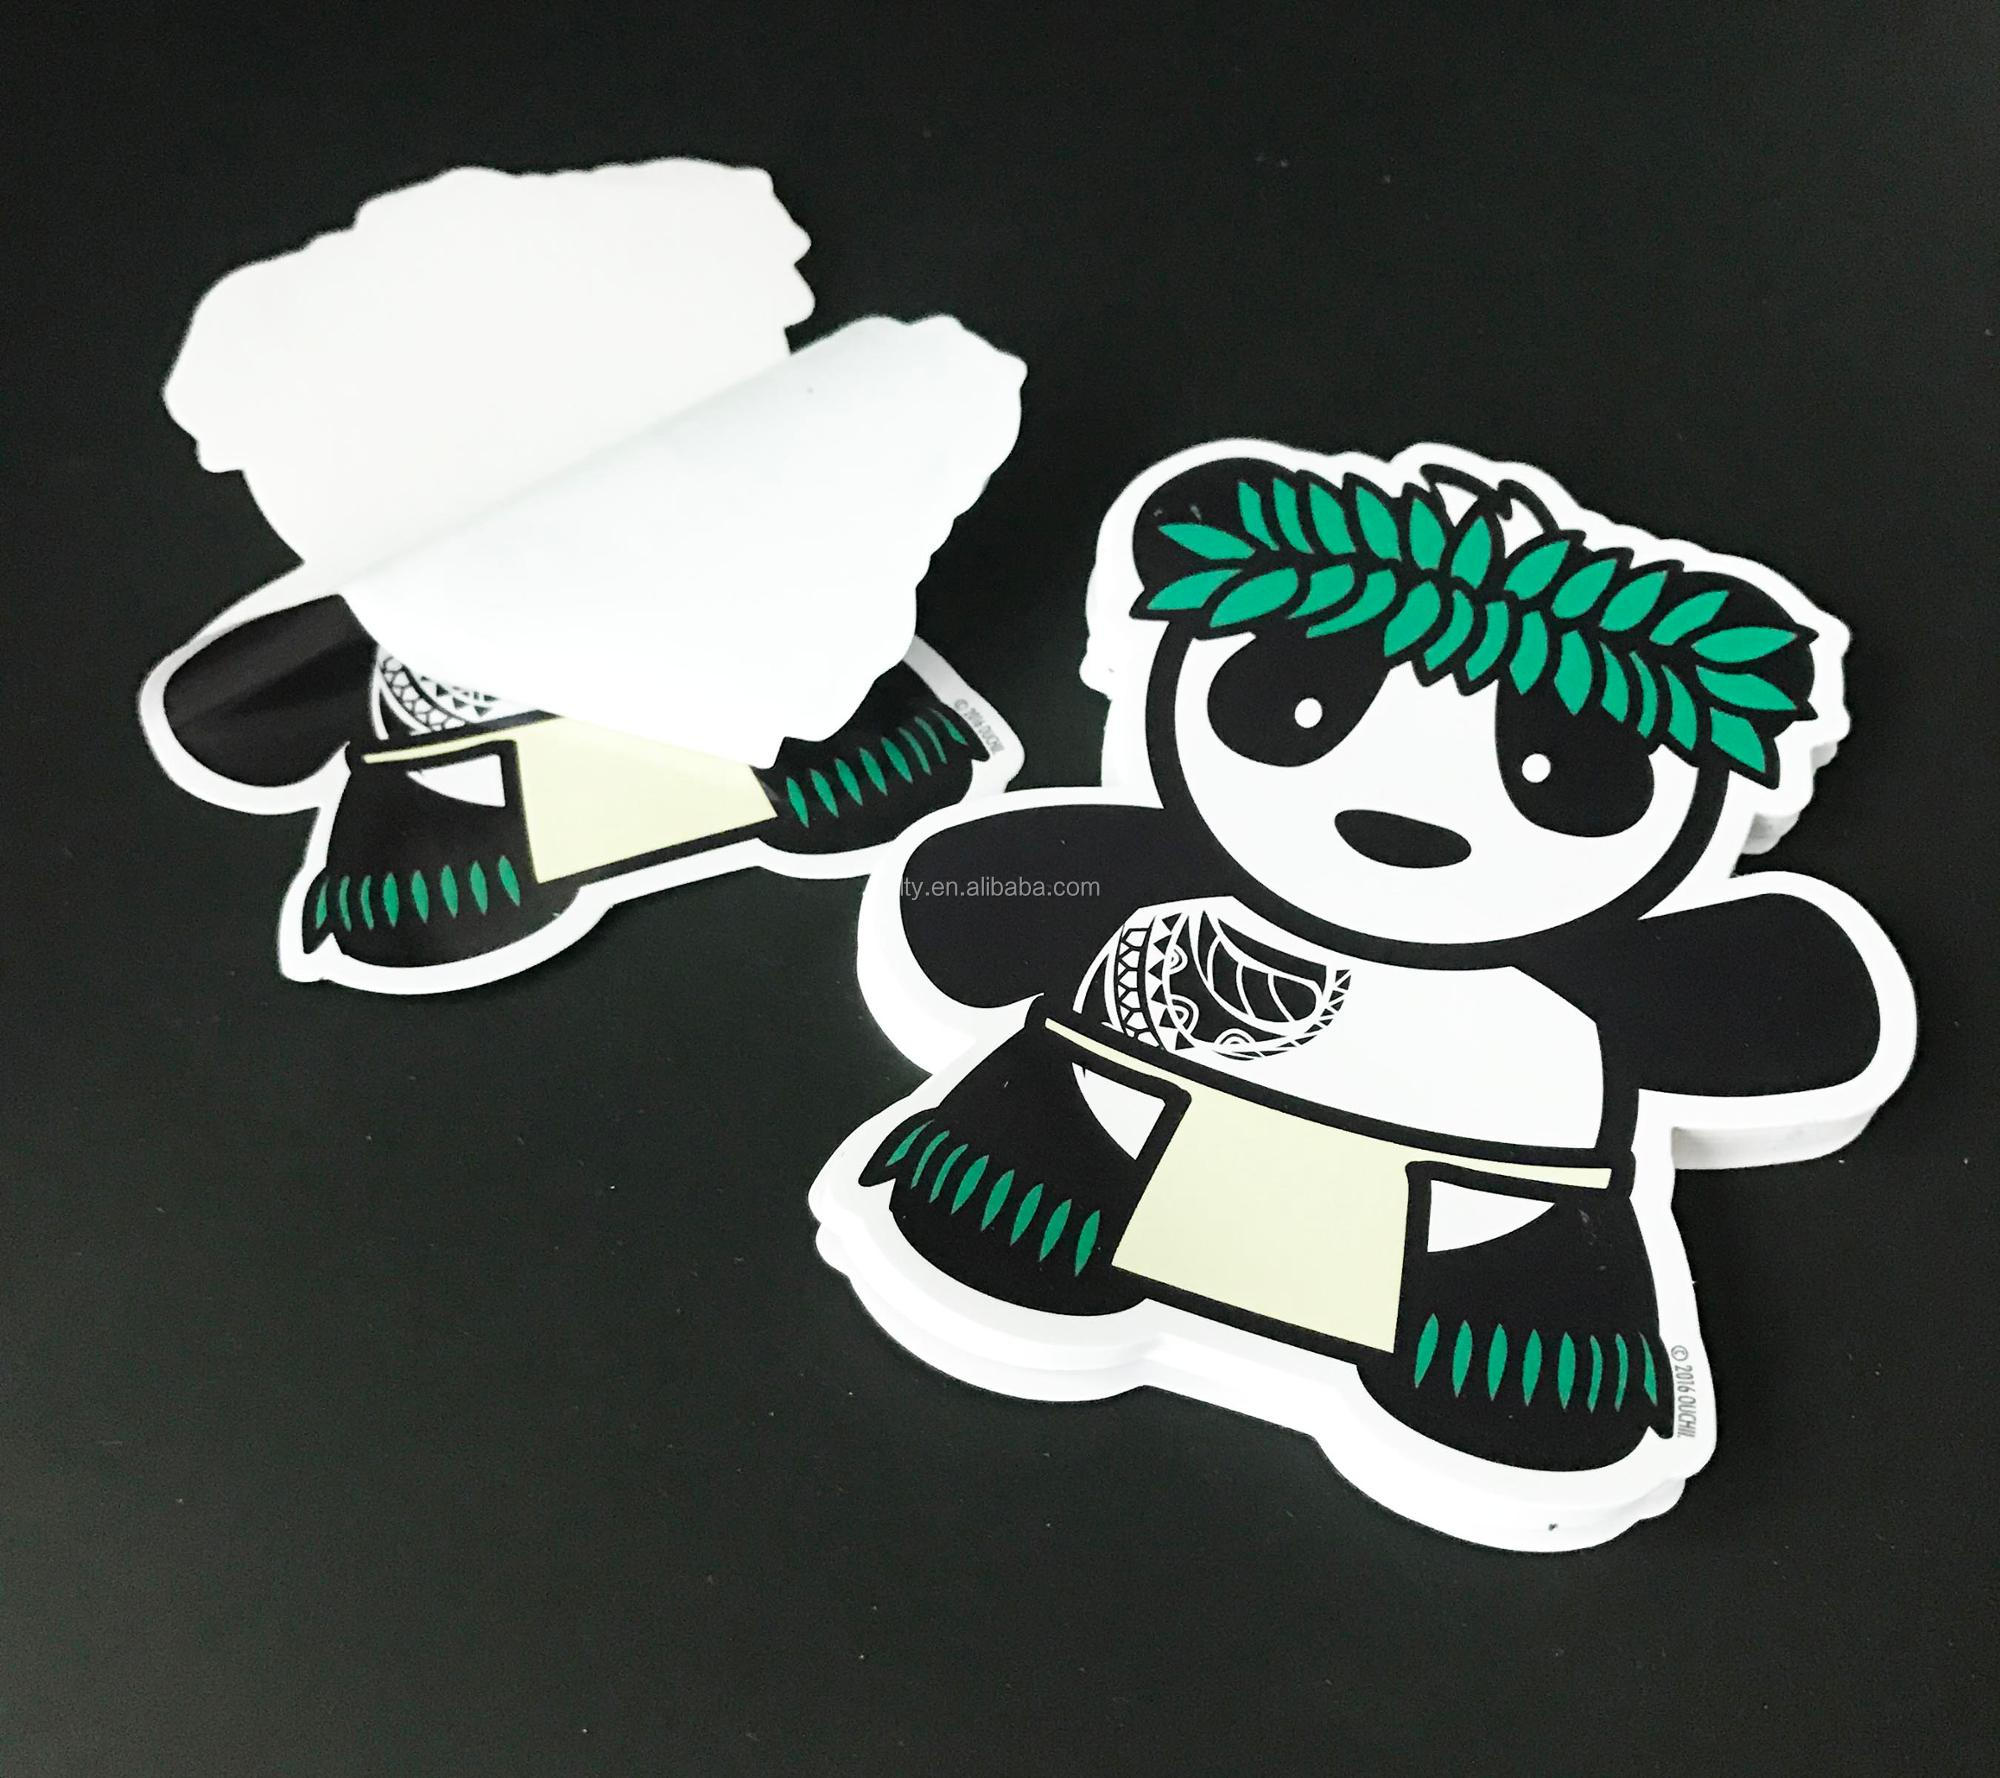 High quality die cut custom stickers printing stickers printing printing stickers ss 526